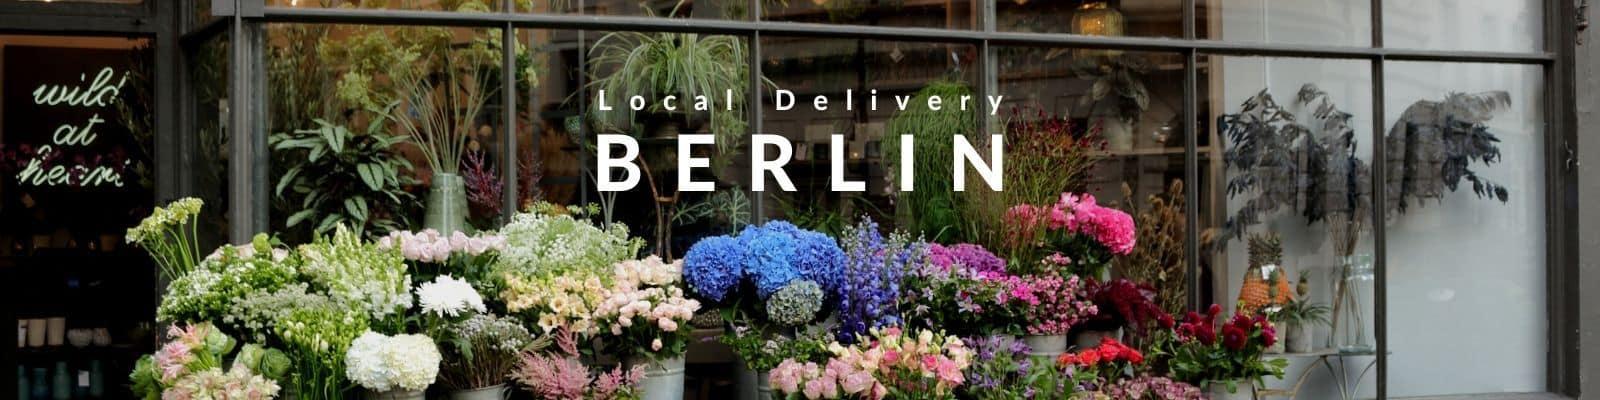 Flower Delivery Berlin - Send Flowers to Berlin